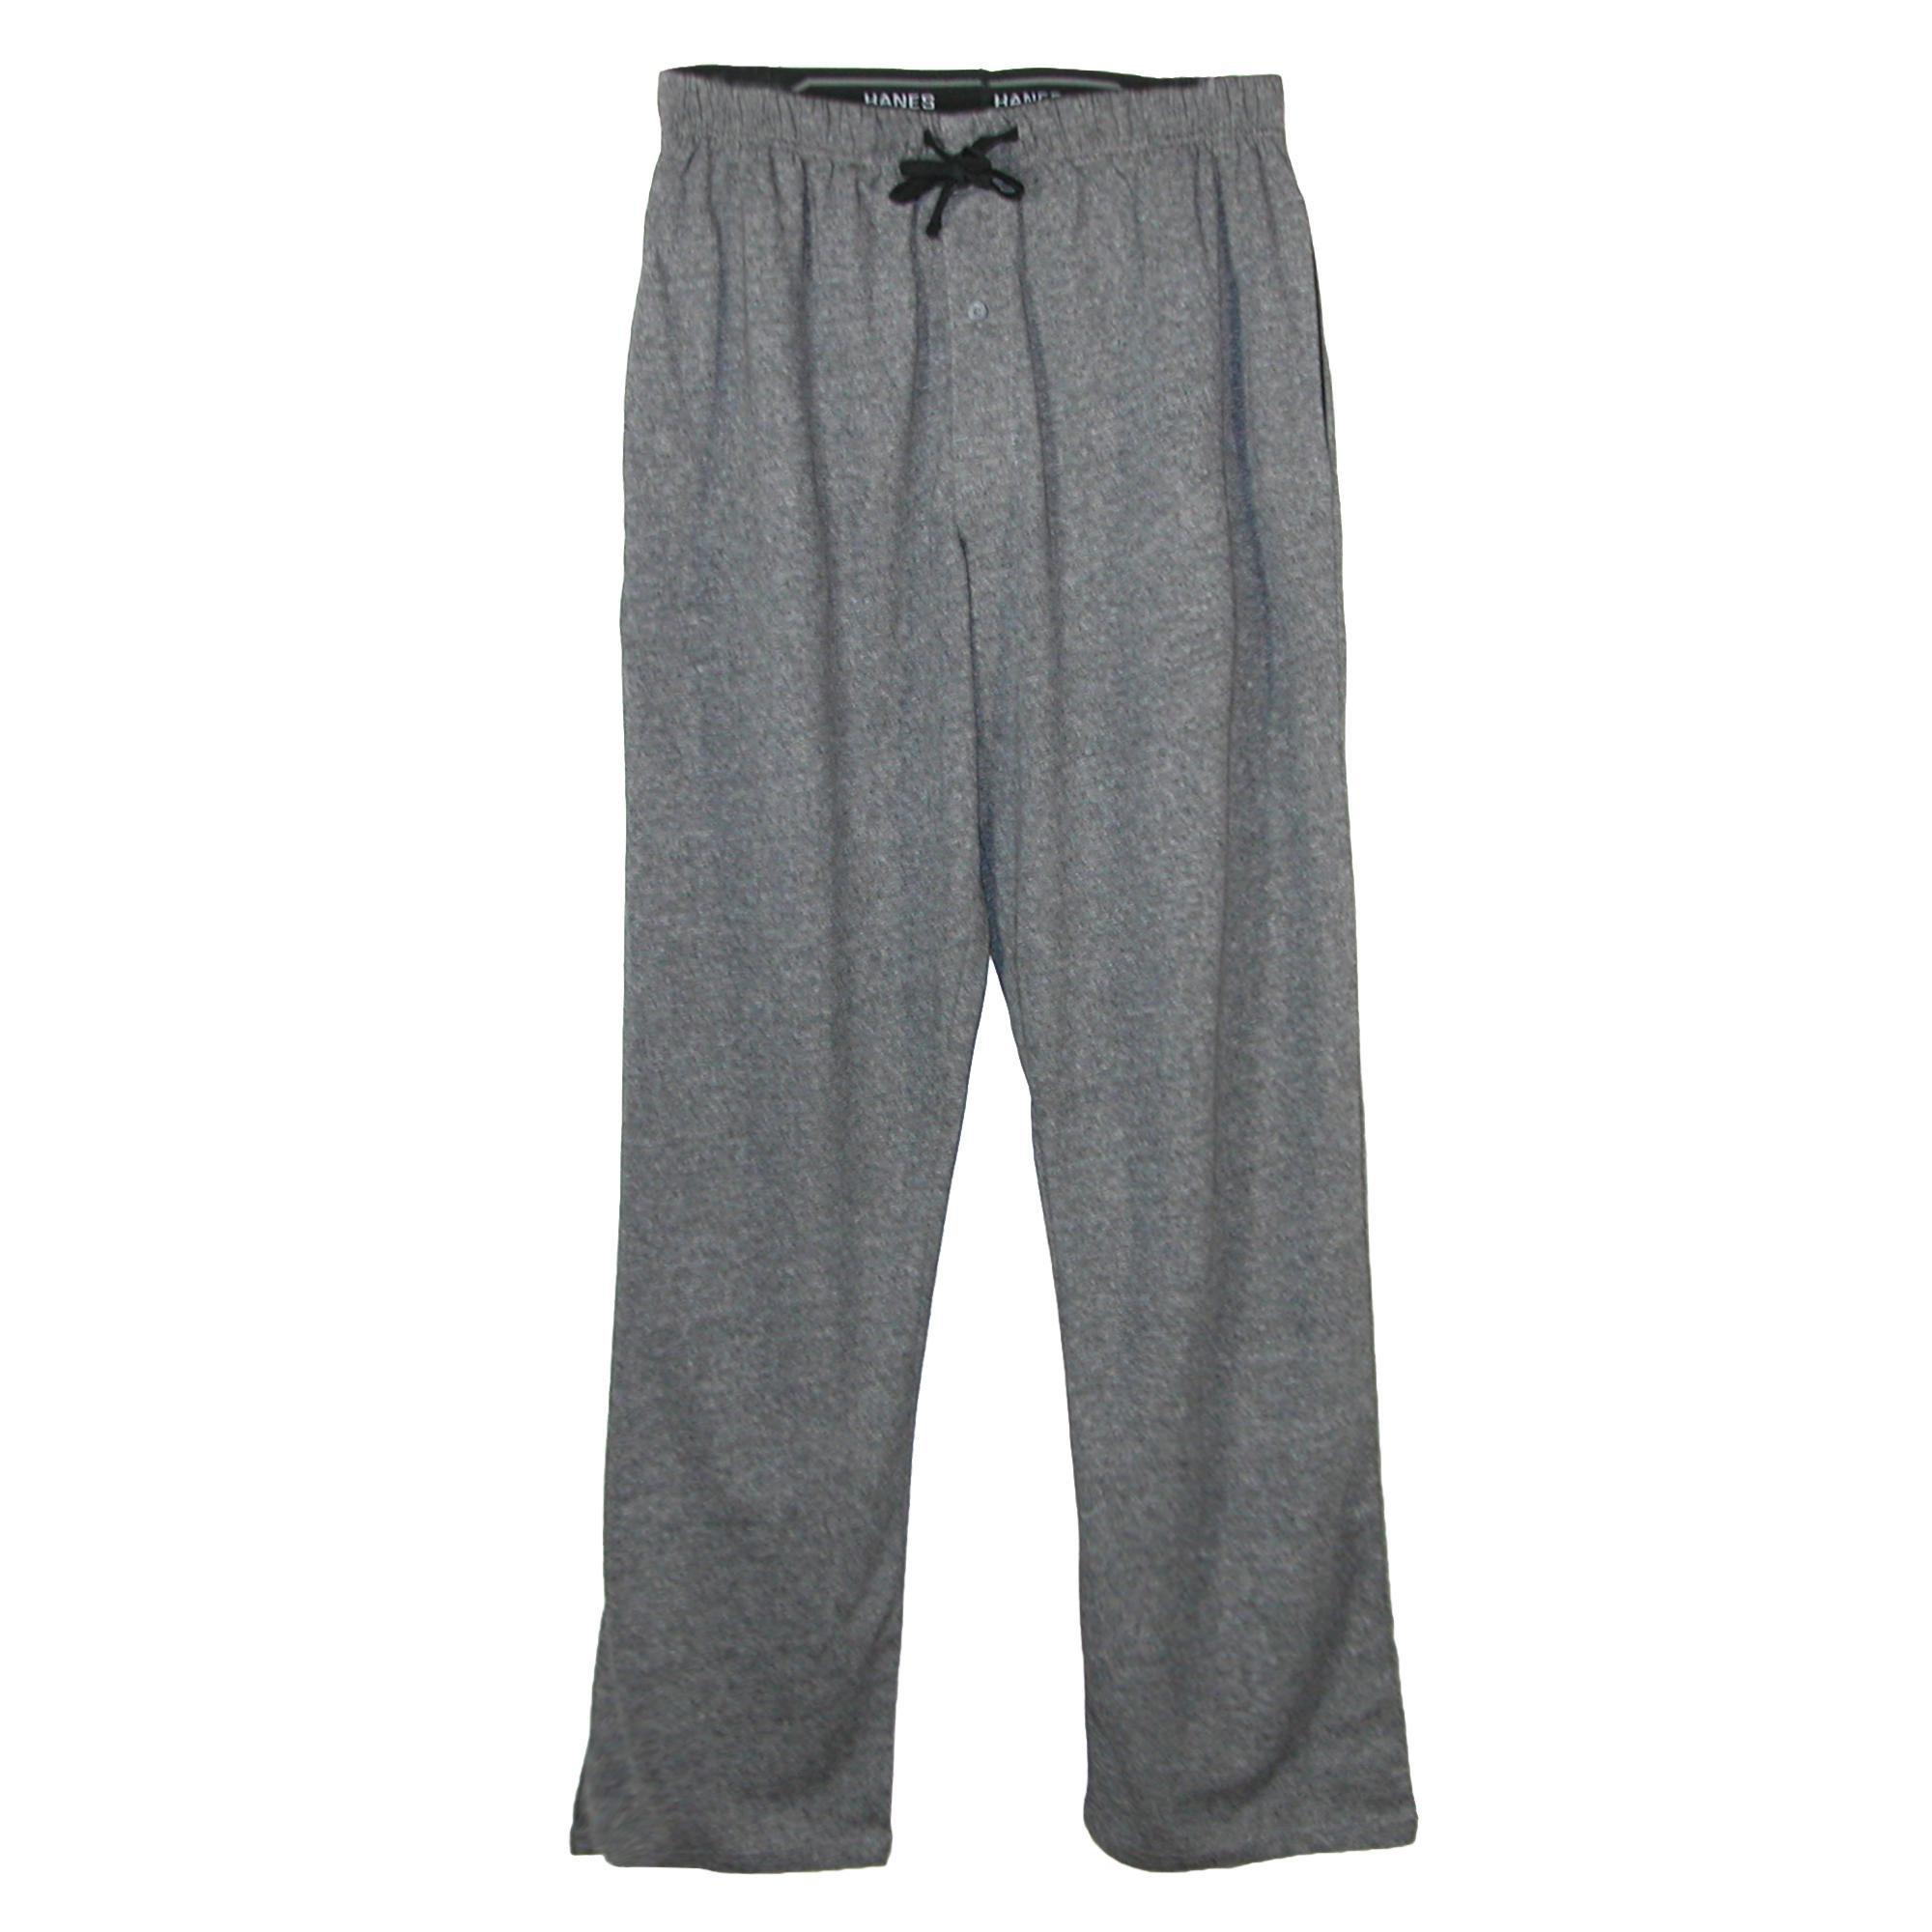 Hanes Men's X Temp Knit Lounge Pajama Pants, Large, New Grey